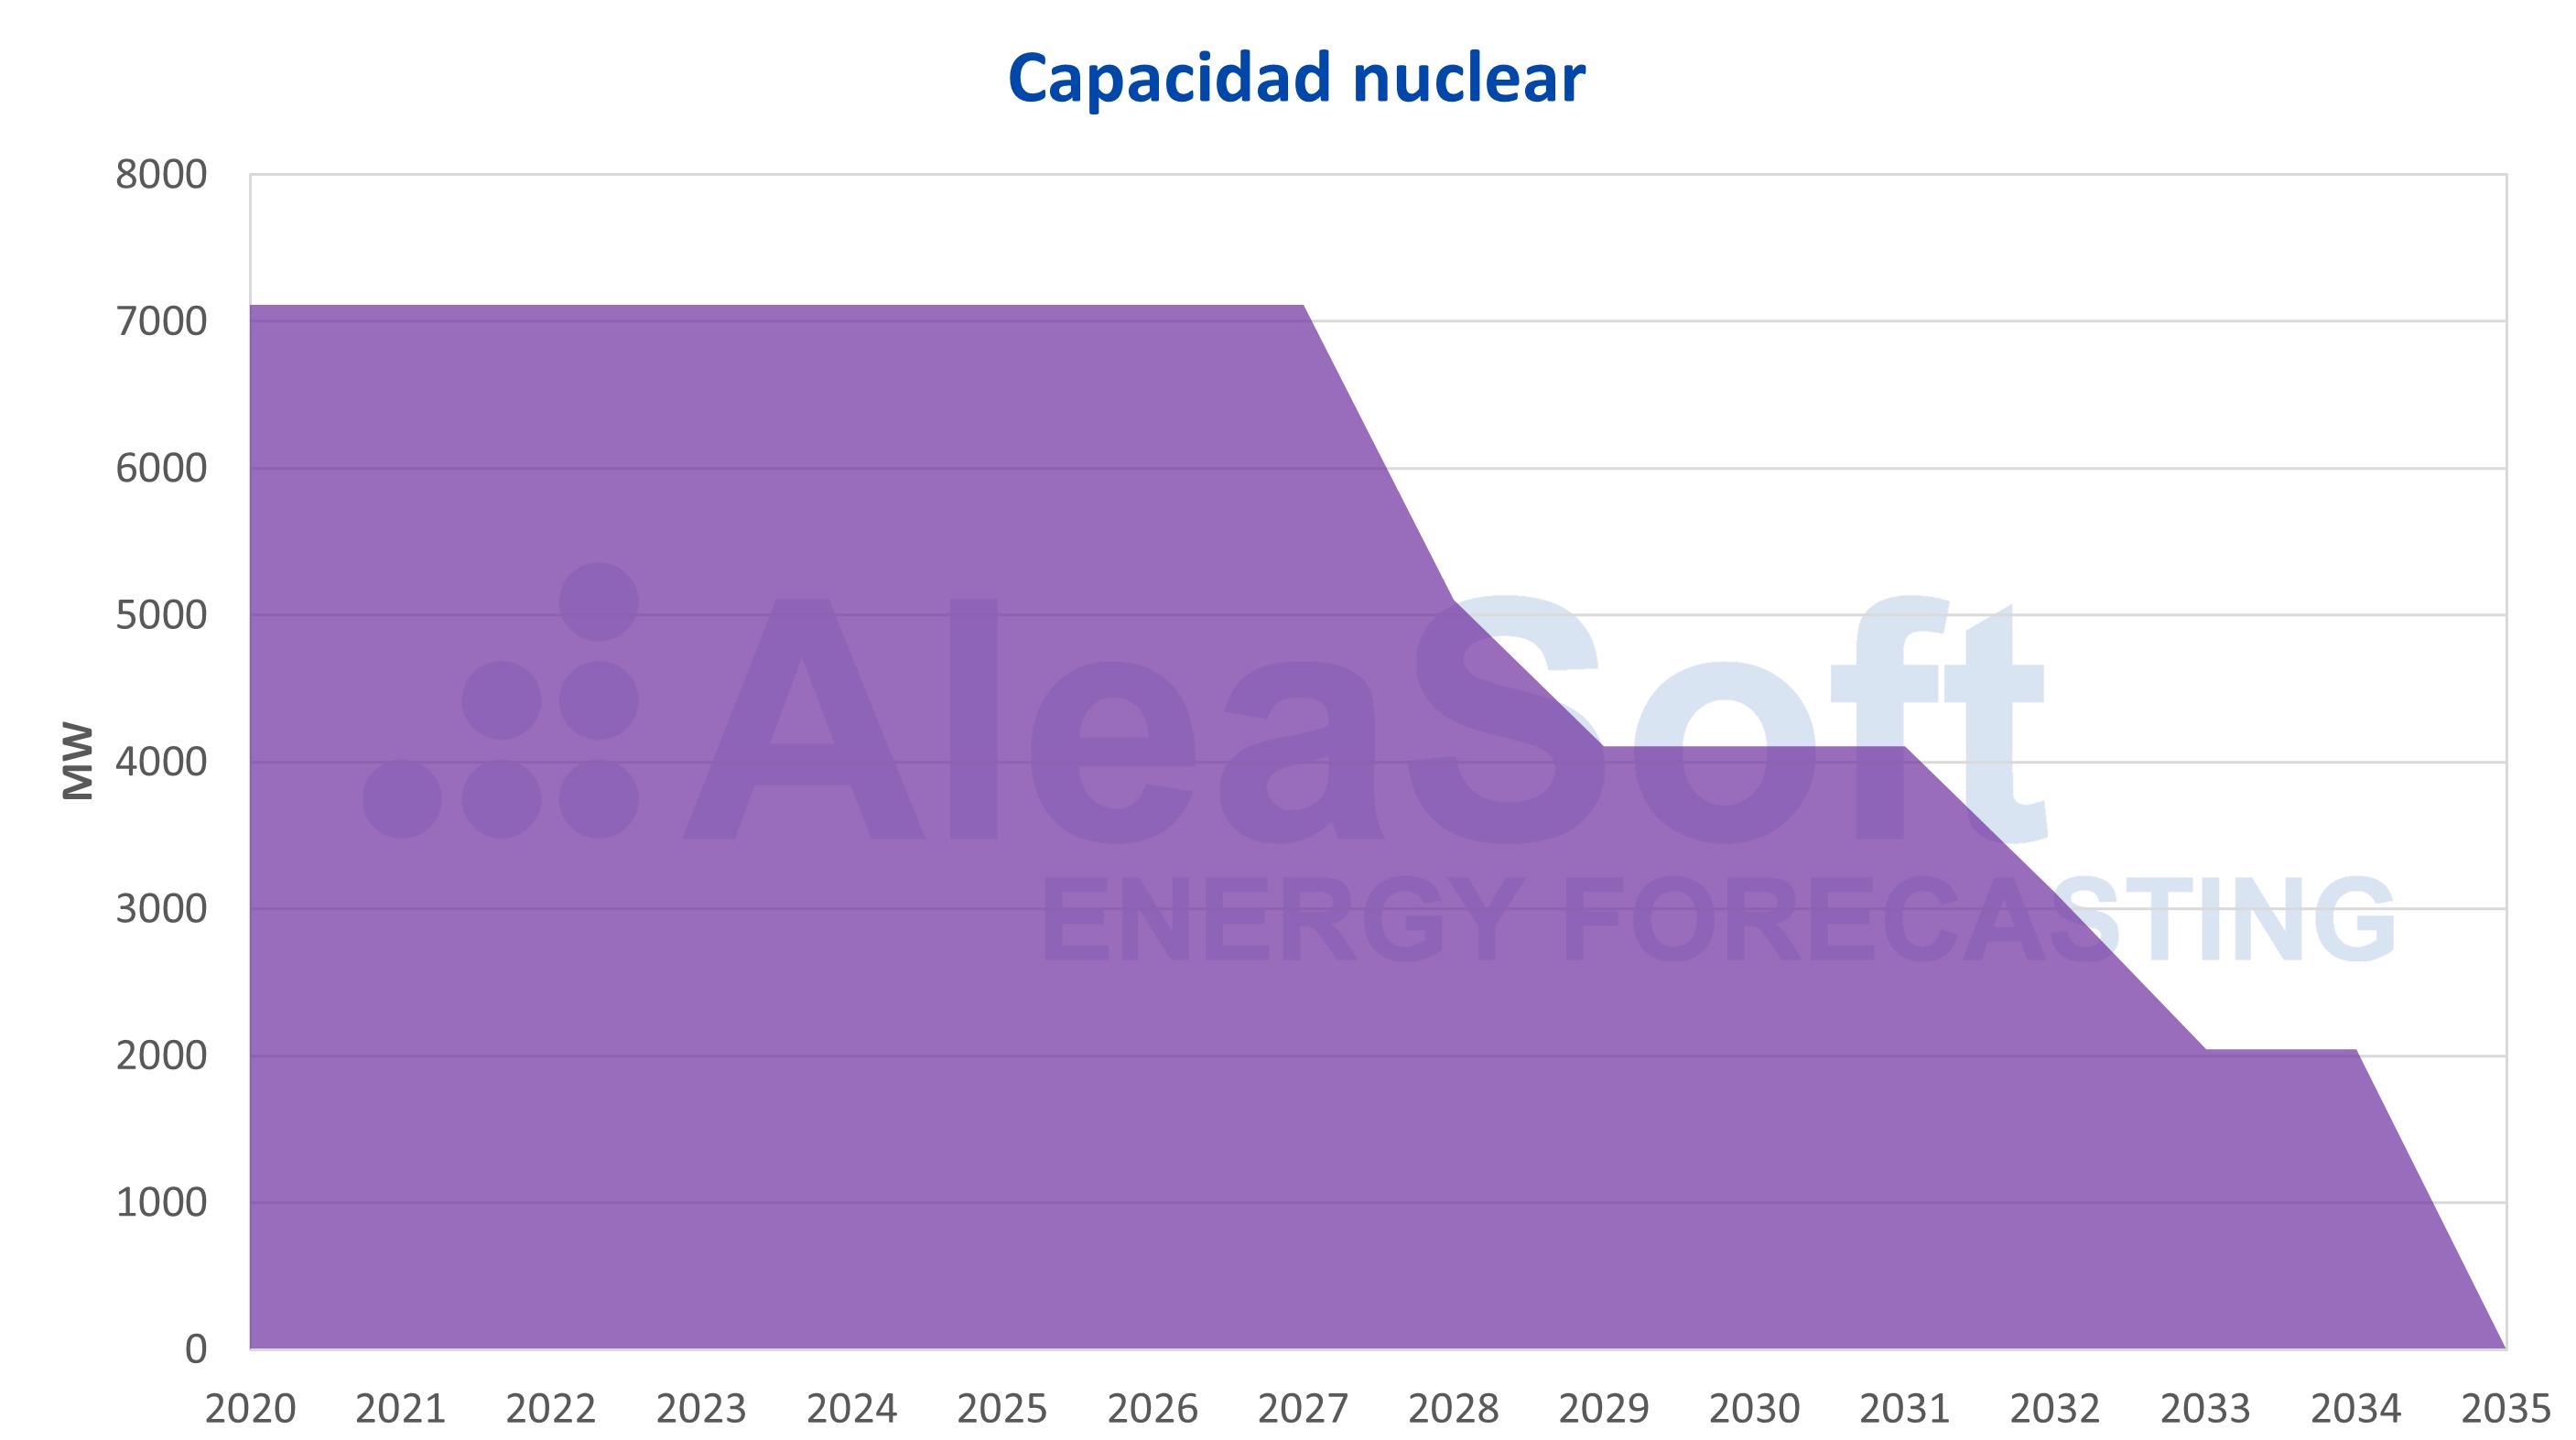 AleaSoft - Potencia apagon nuclear España